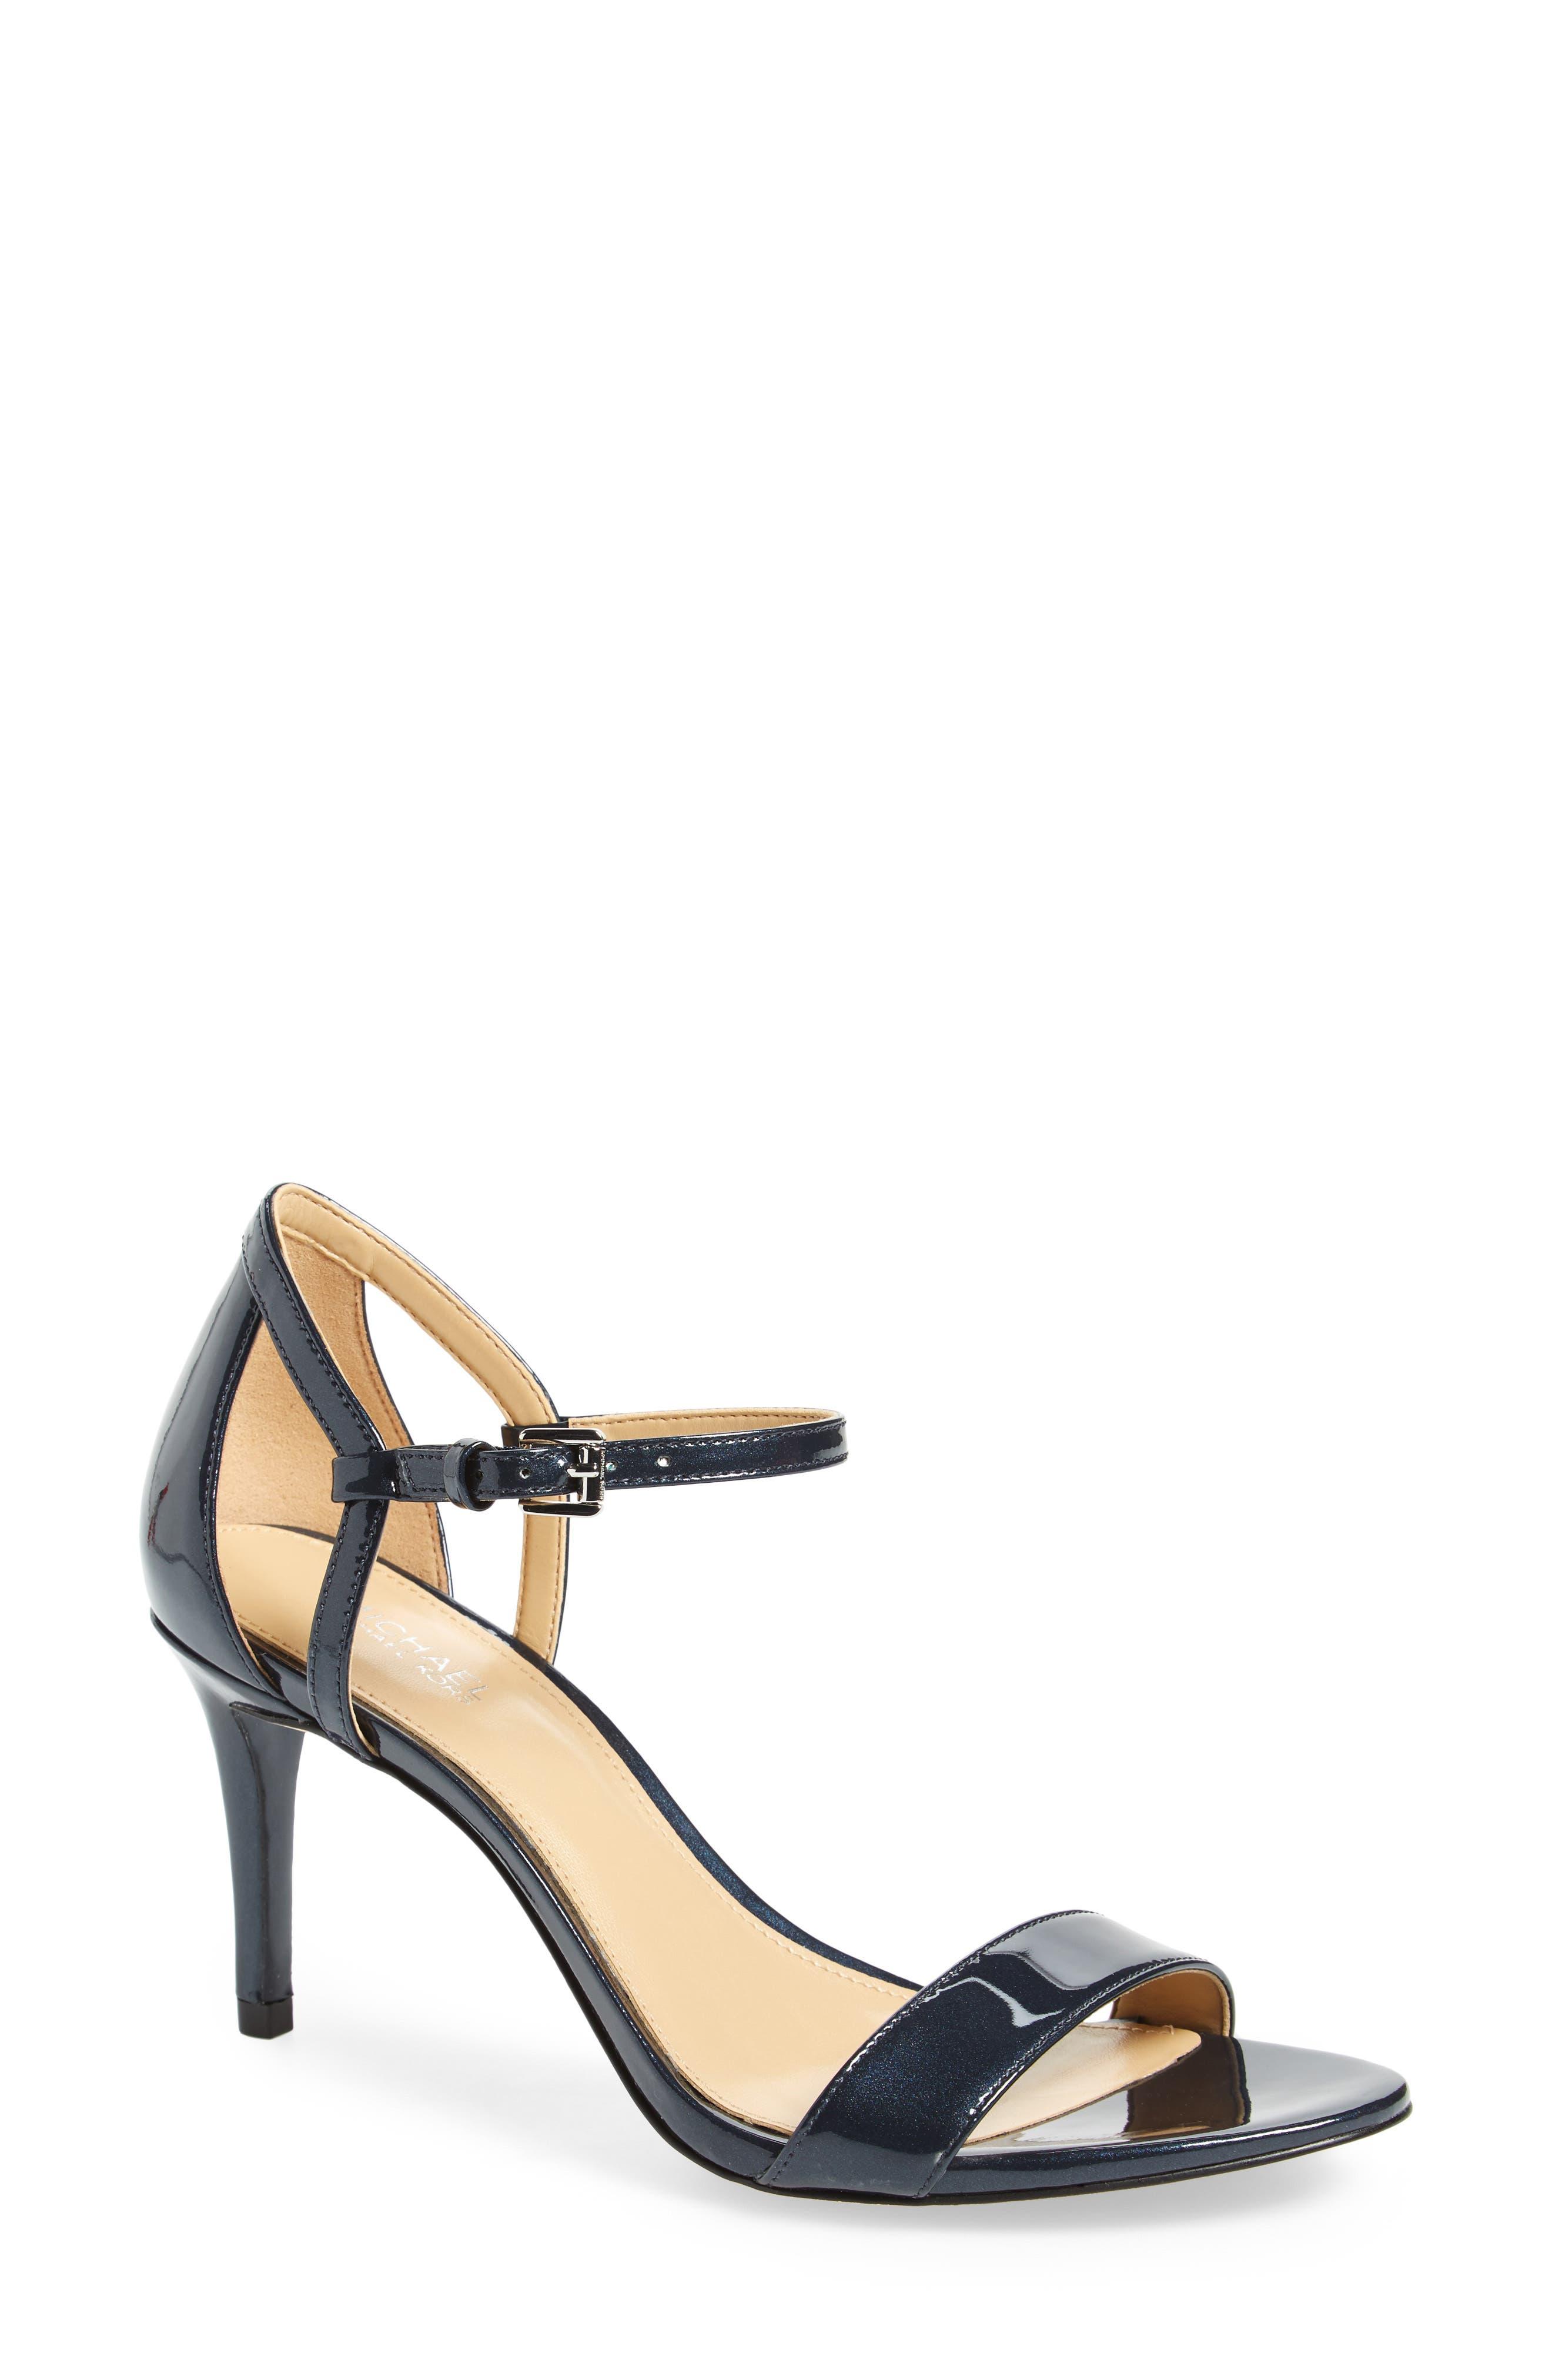 Main Image - MICHAEL Michael Kors 'Simone' Sandal (Women)